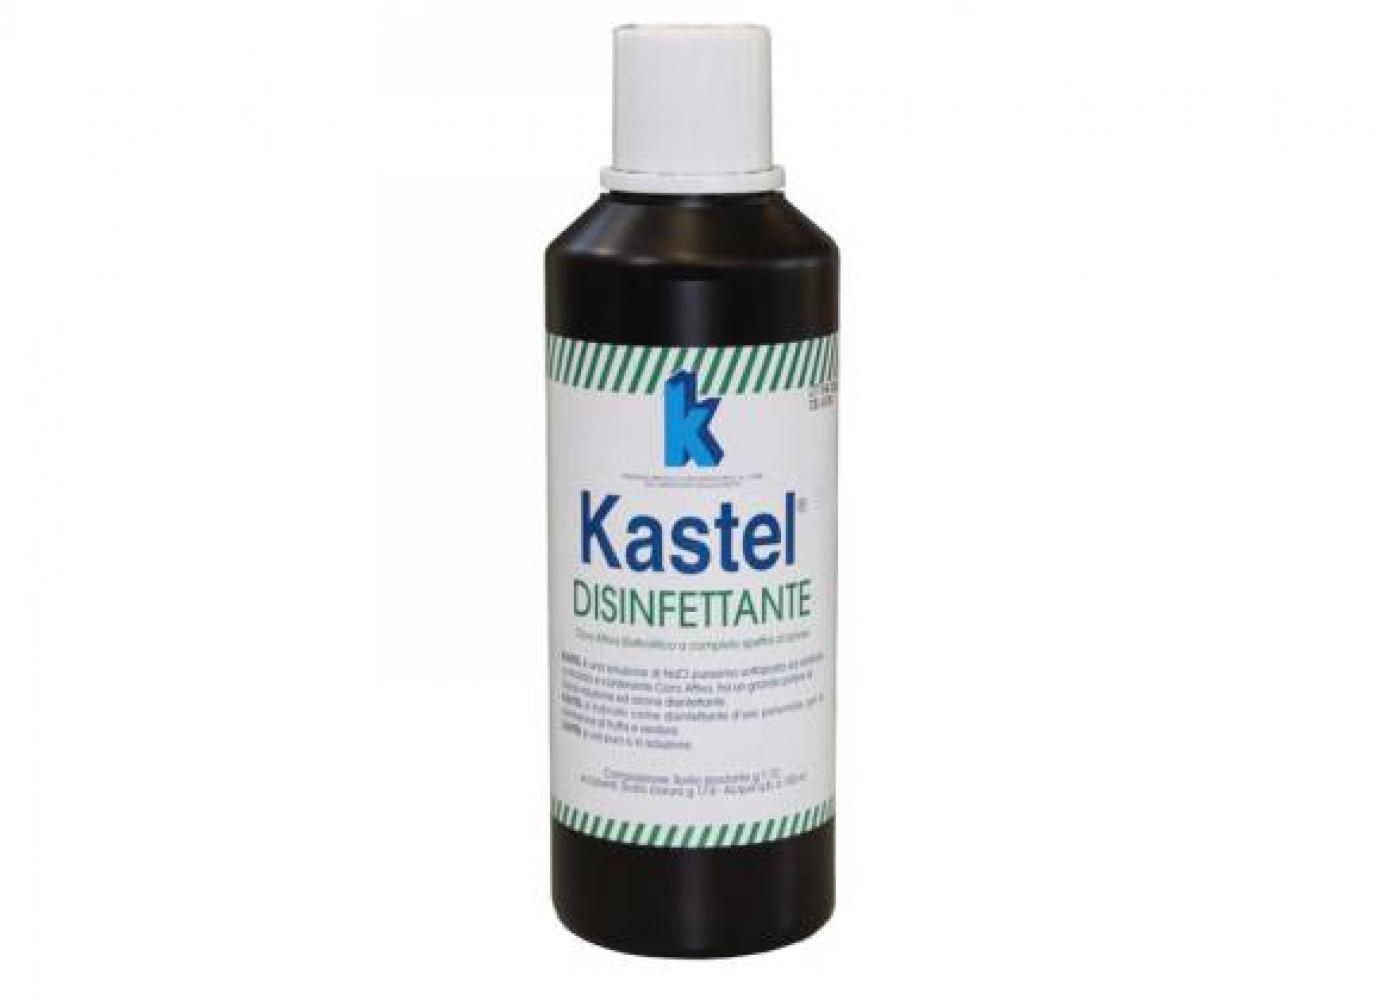 Acquista Kastel Disinfettante Clorattivo 17545719 | Glooke.com